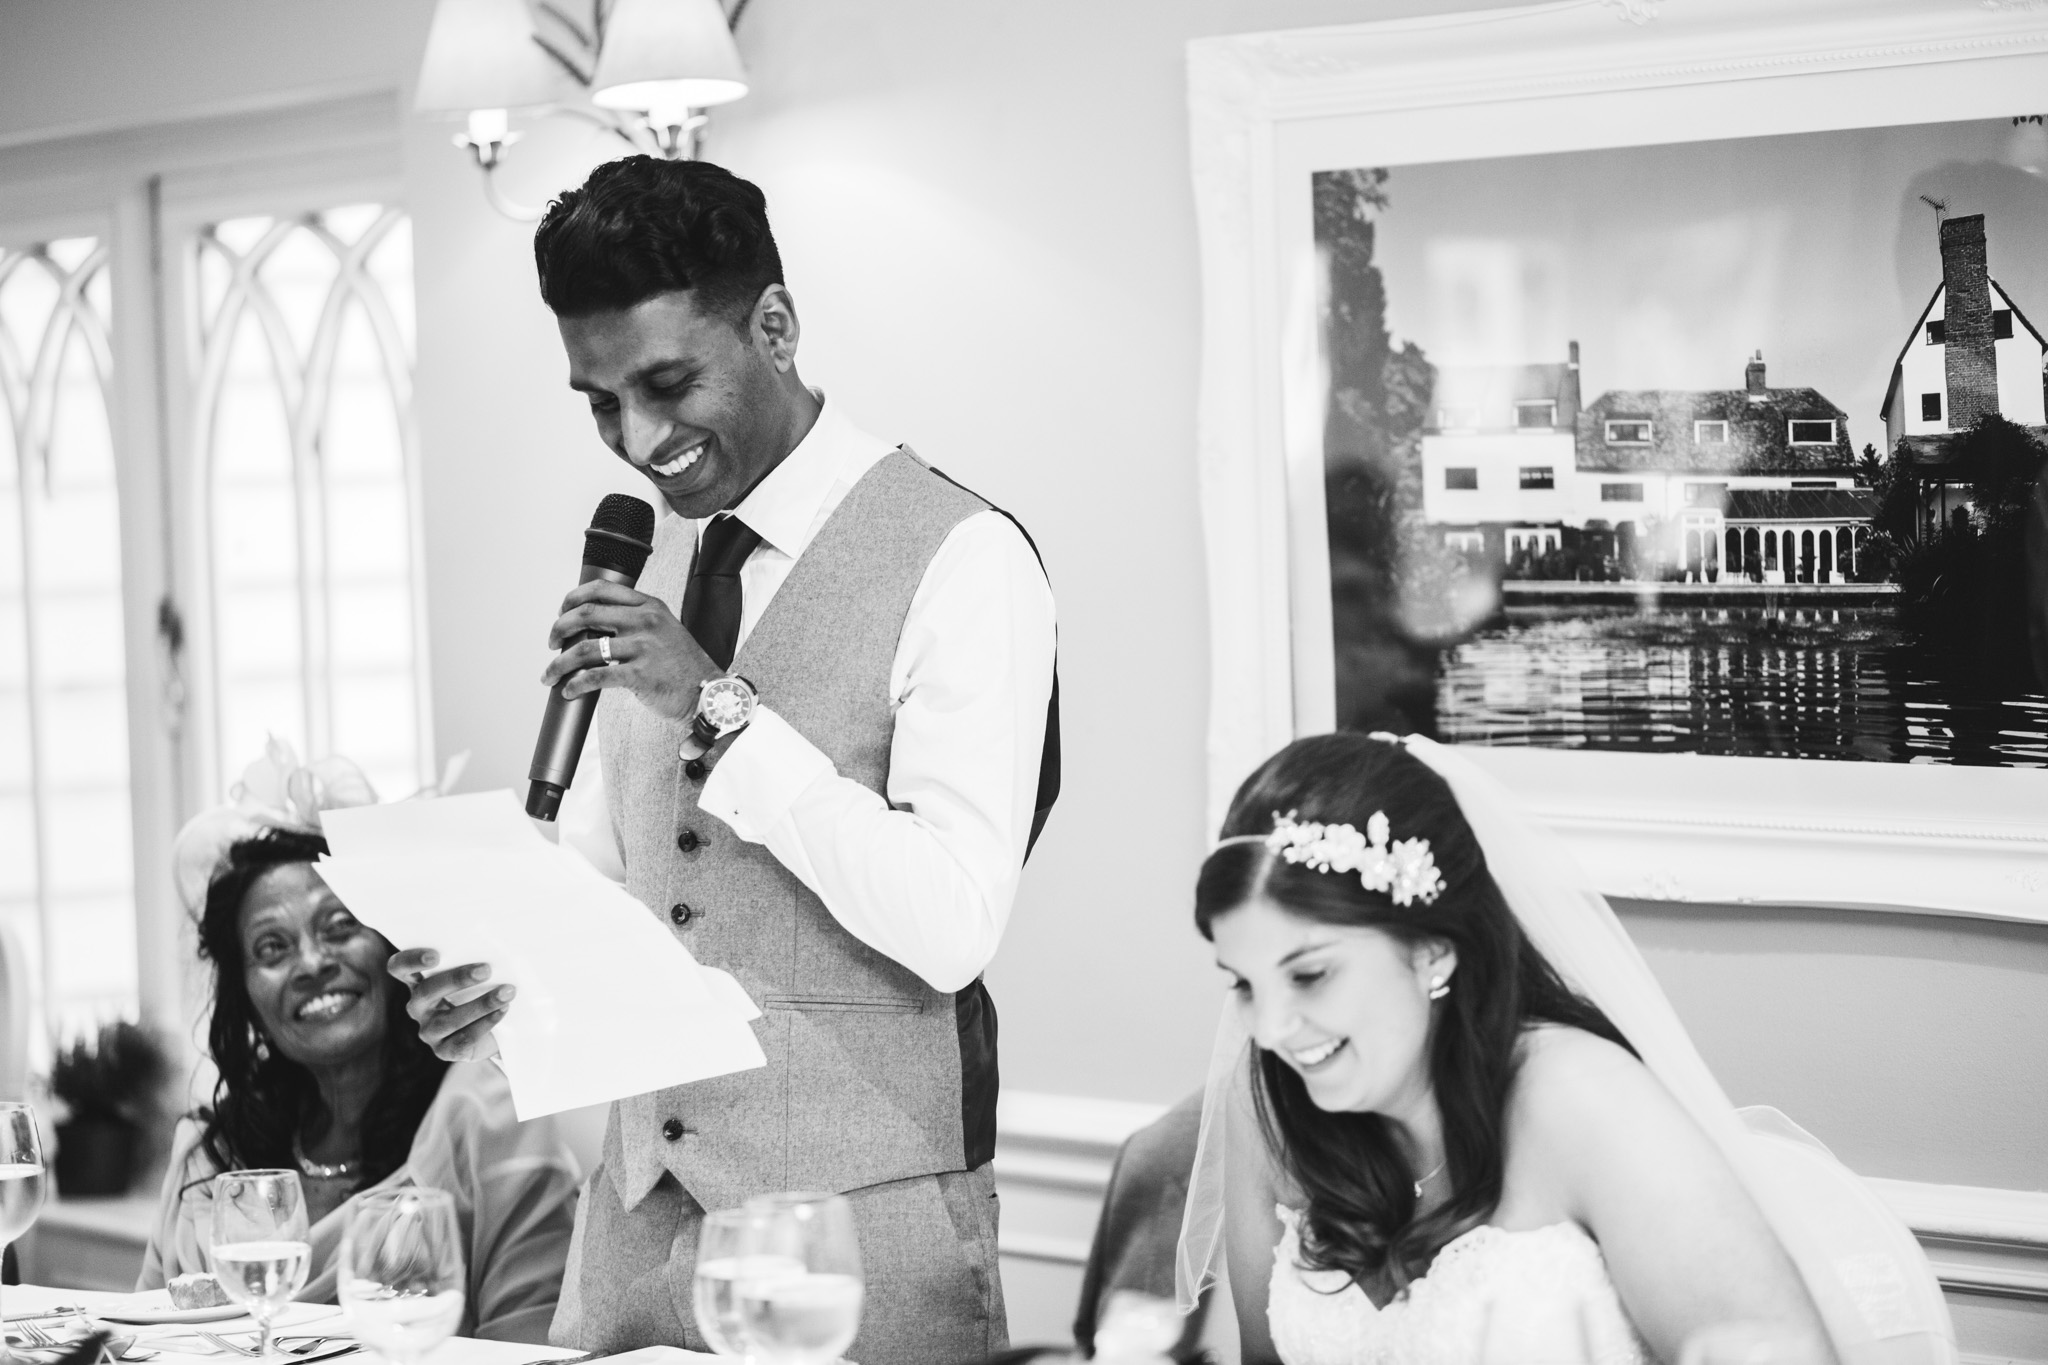 cat-lane-weddings__sheene-mill-wedding-photography__clw__1708__C5A9890.jpg